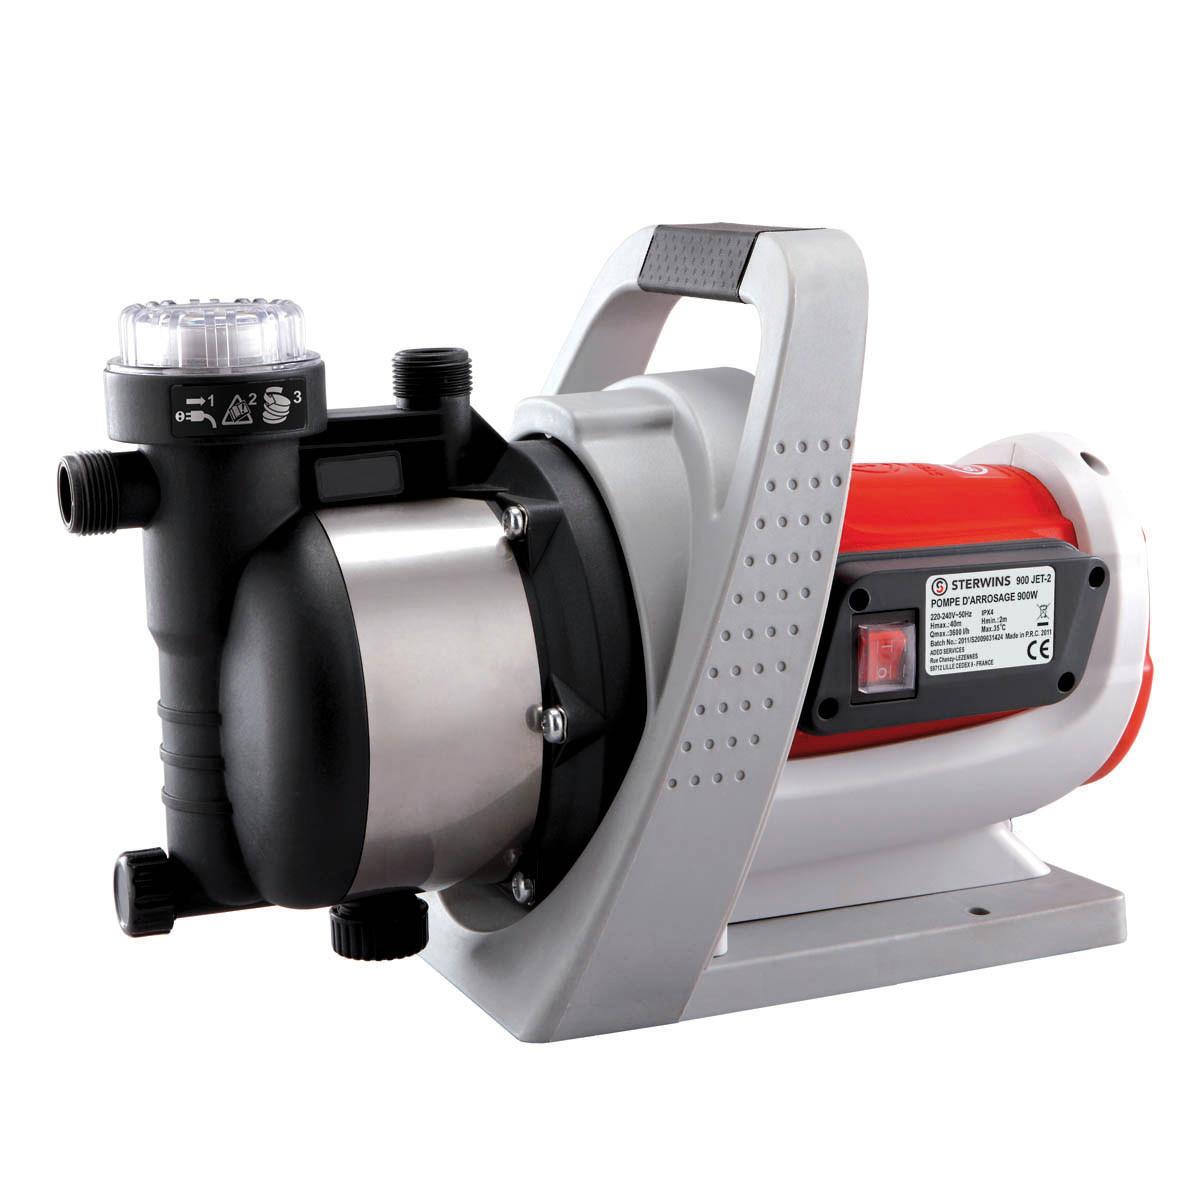 Ribimex pompa di superficie biturbina centrifuga 2000 for Pompa sommersa leroy merlin